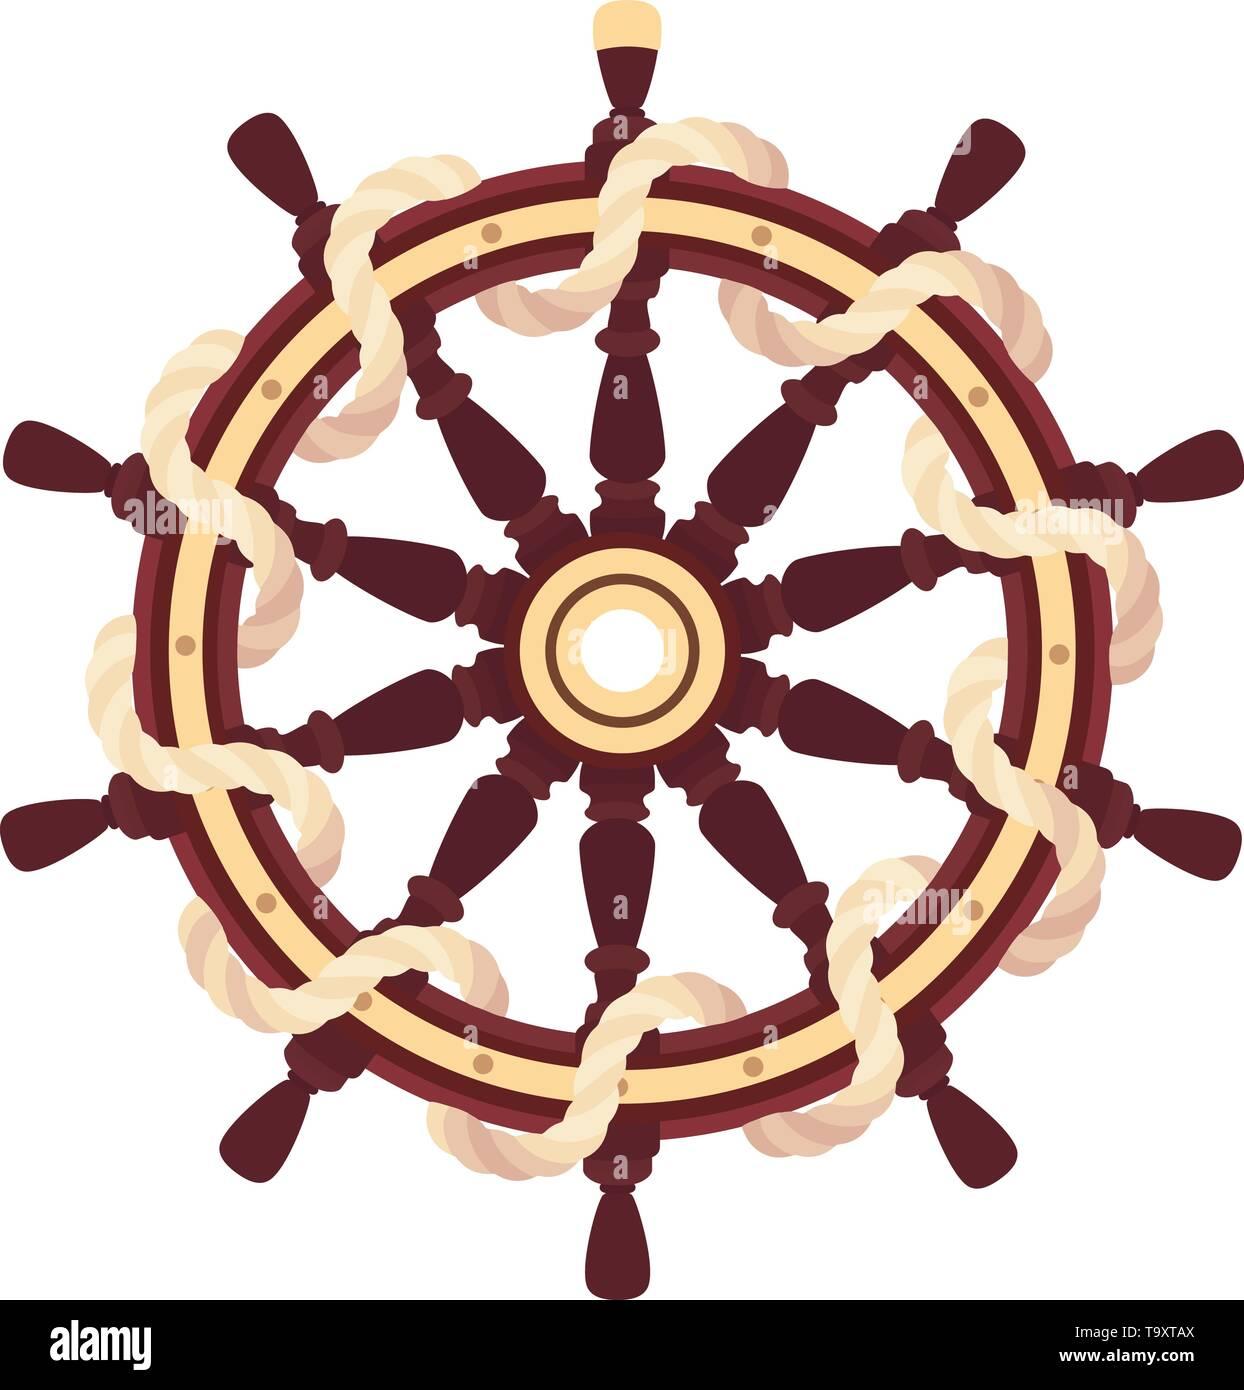 vector flat boat rope handwheel, ship wheel helm. Sea, ocean symbol - Stock Image